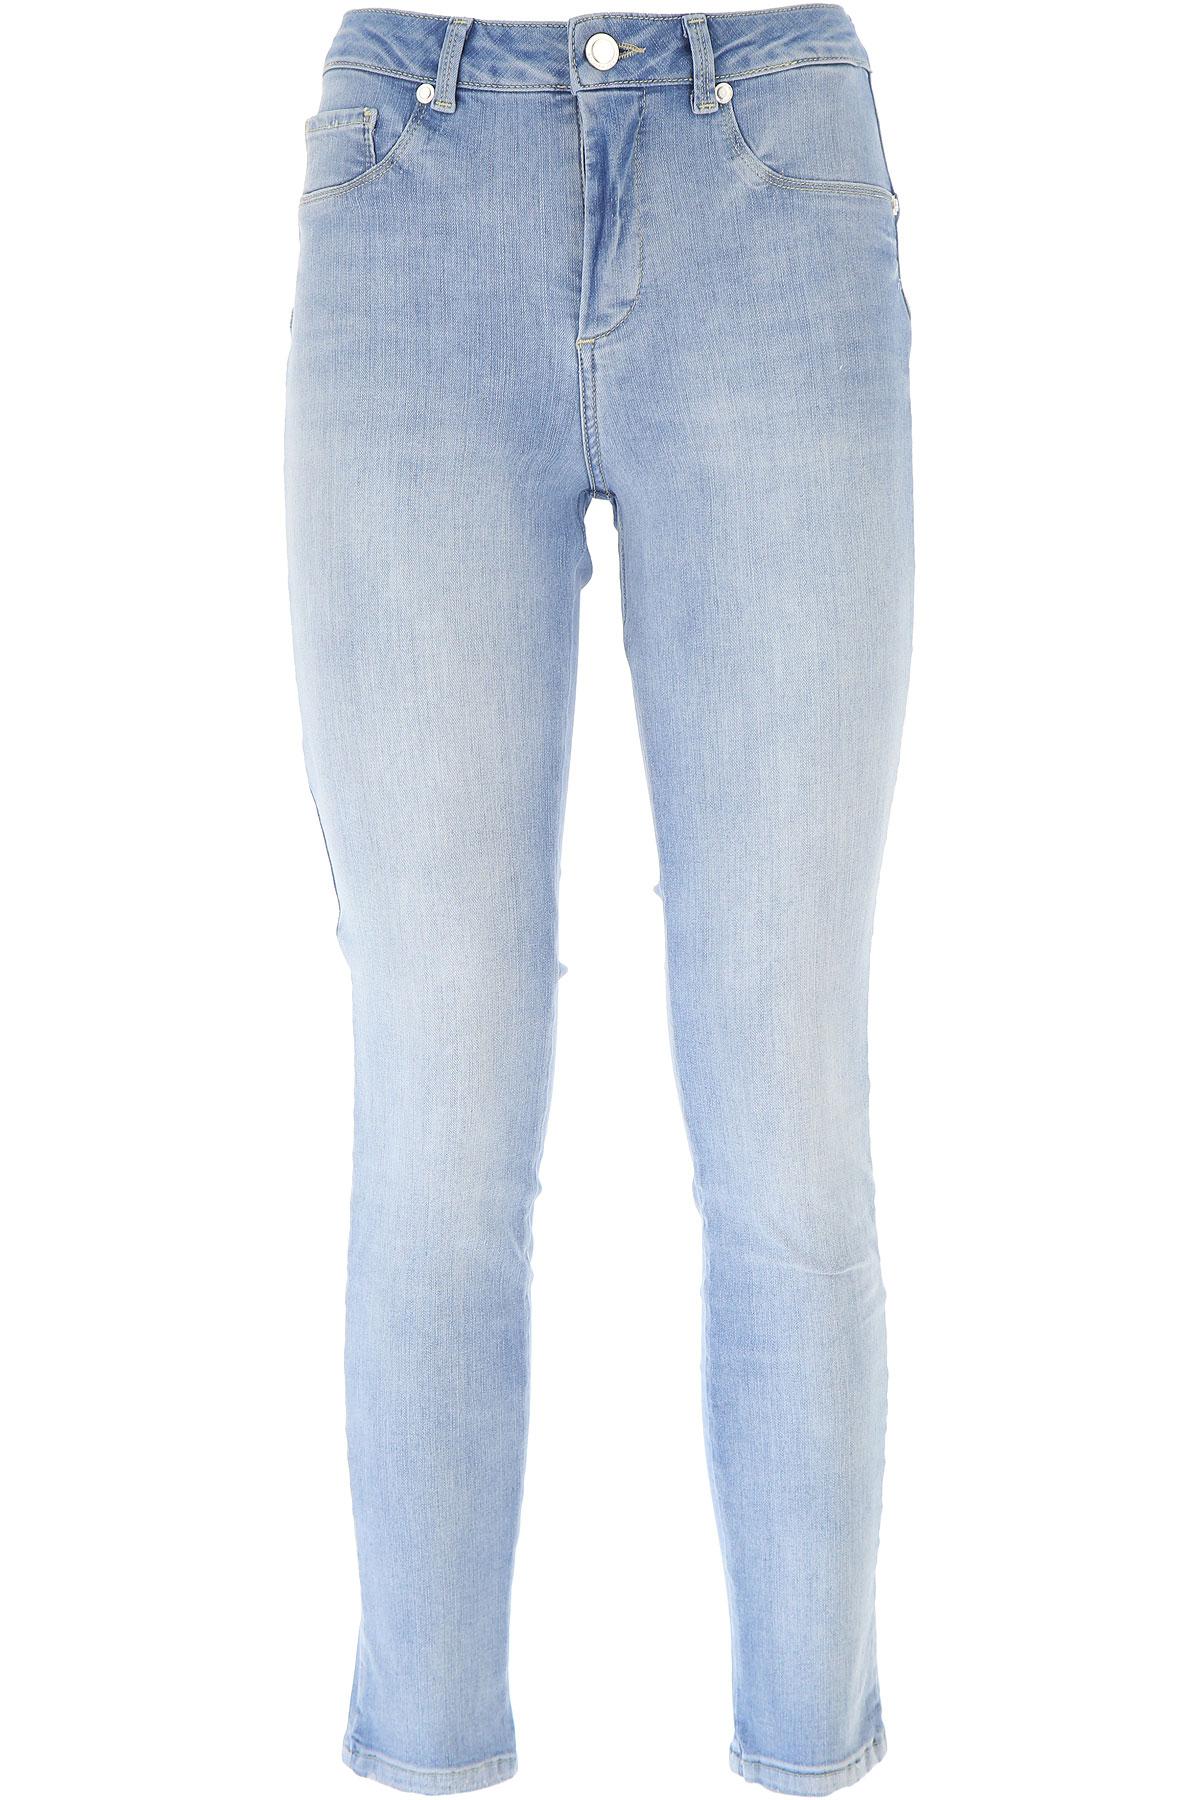 Silvian Heach Jeans On Sale, Denim Blue, Cotton, 2019, 25 27 28 30